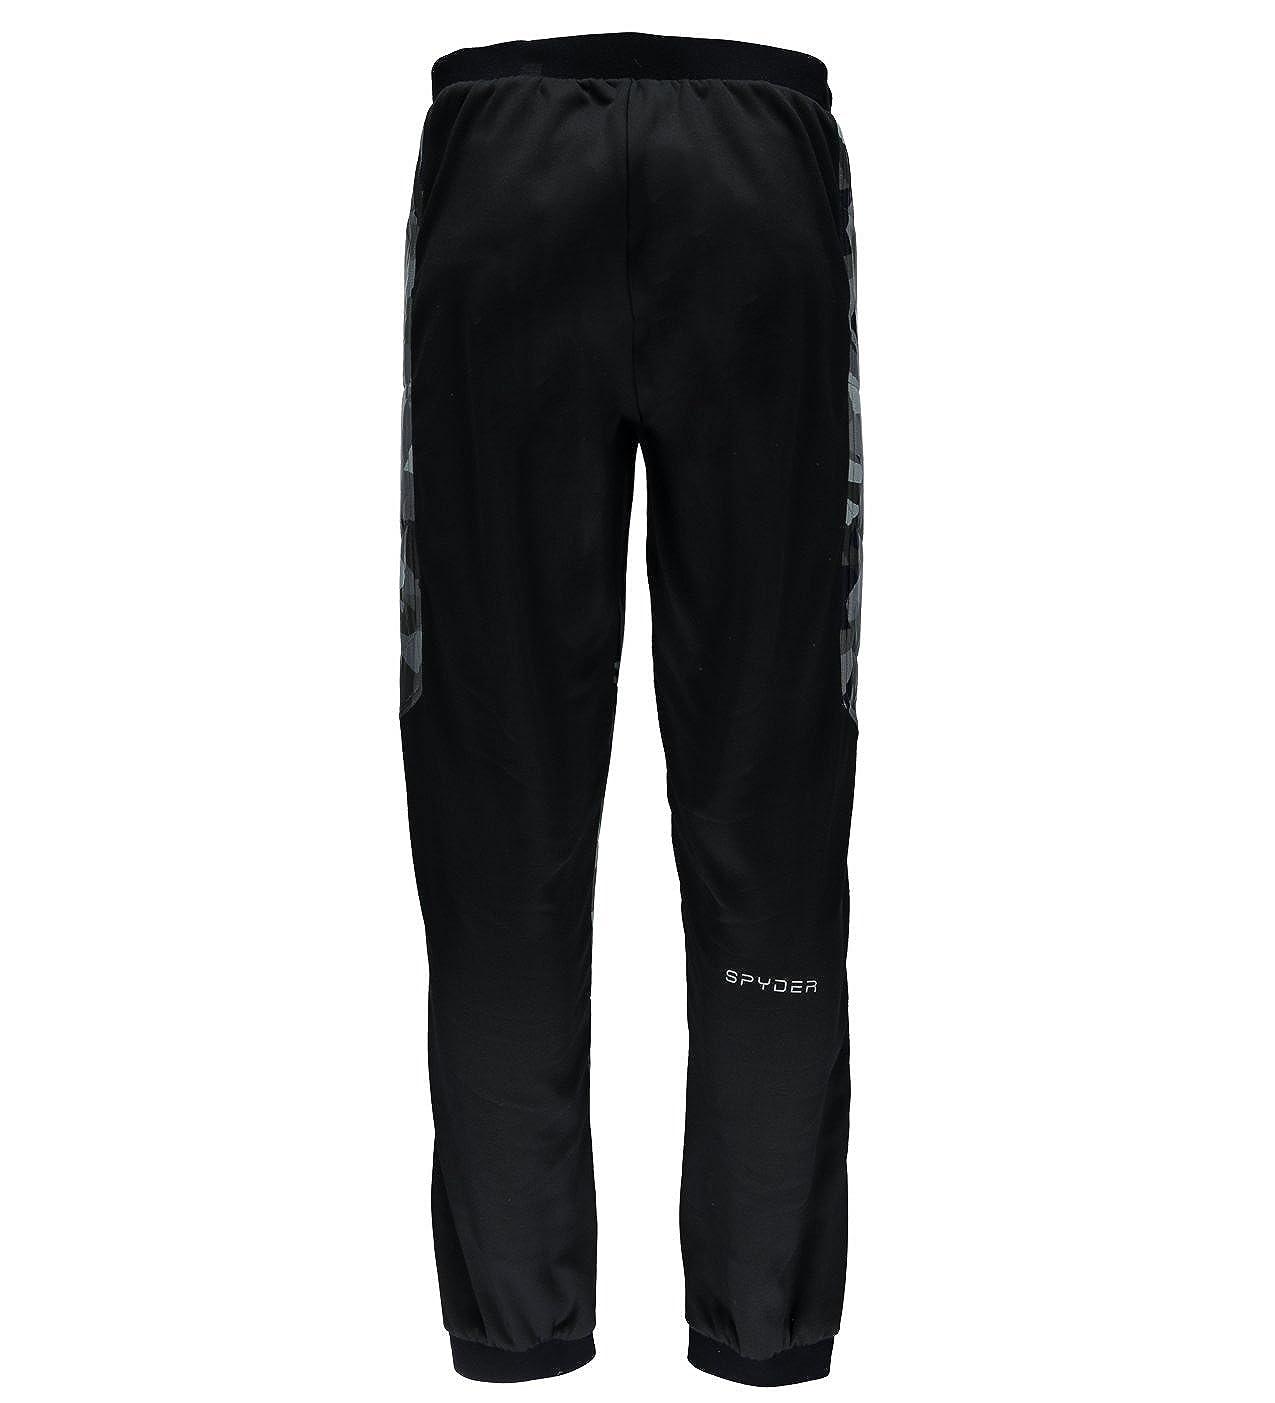 Spyder Men/'s Glissade Insulated Pant